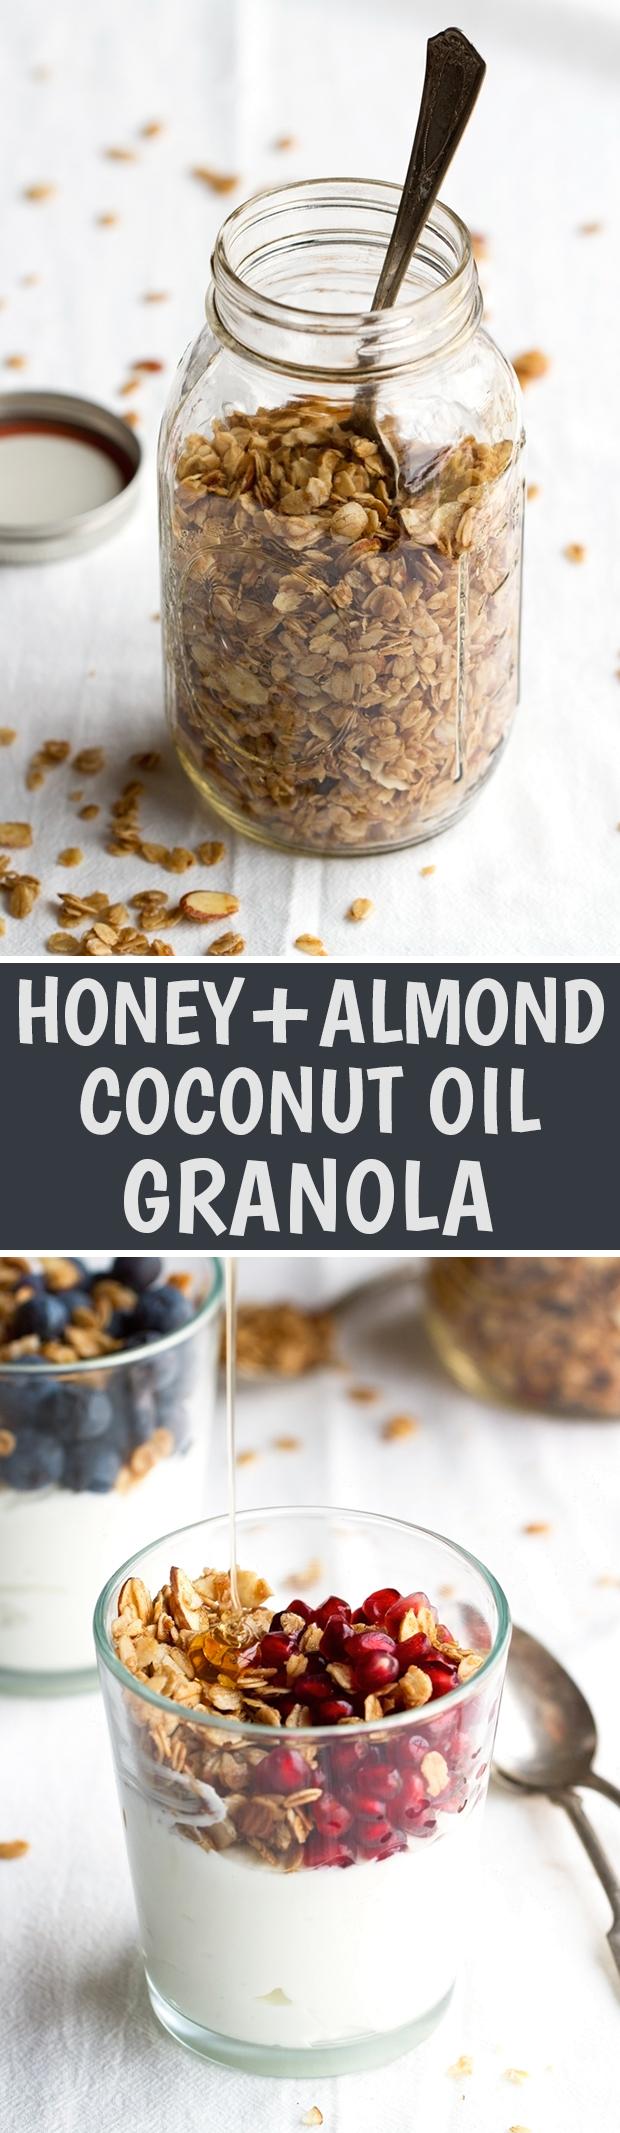 Honey Almond Coconut Oil Granola Recipe | Little Spice Jar